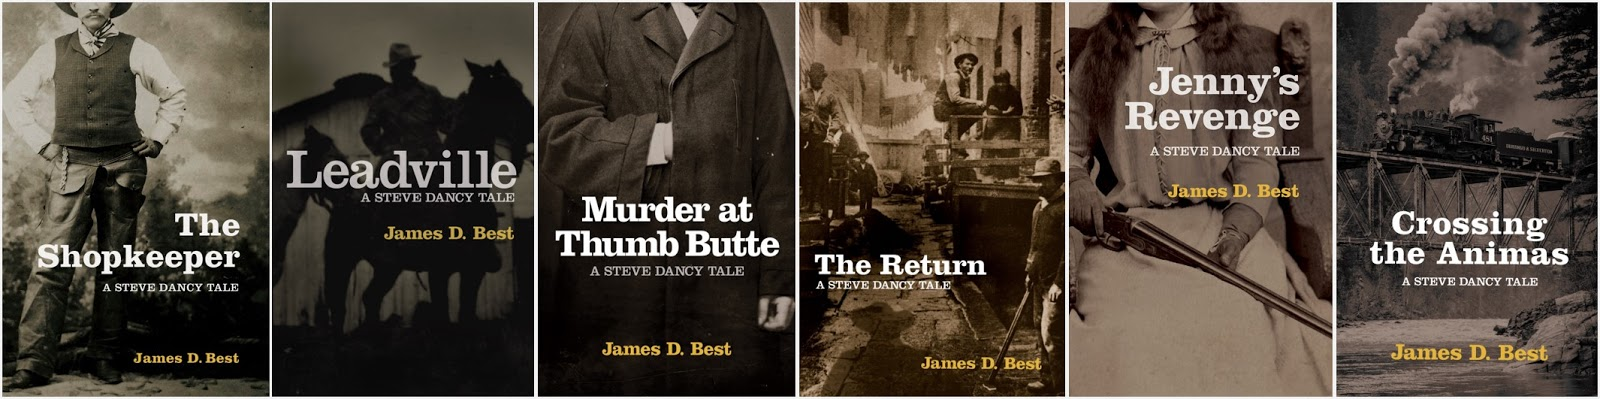 Book Reviews, Creative Culture